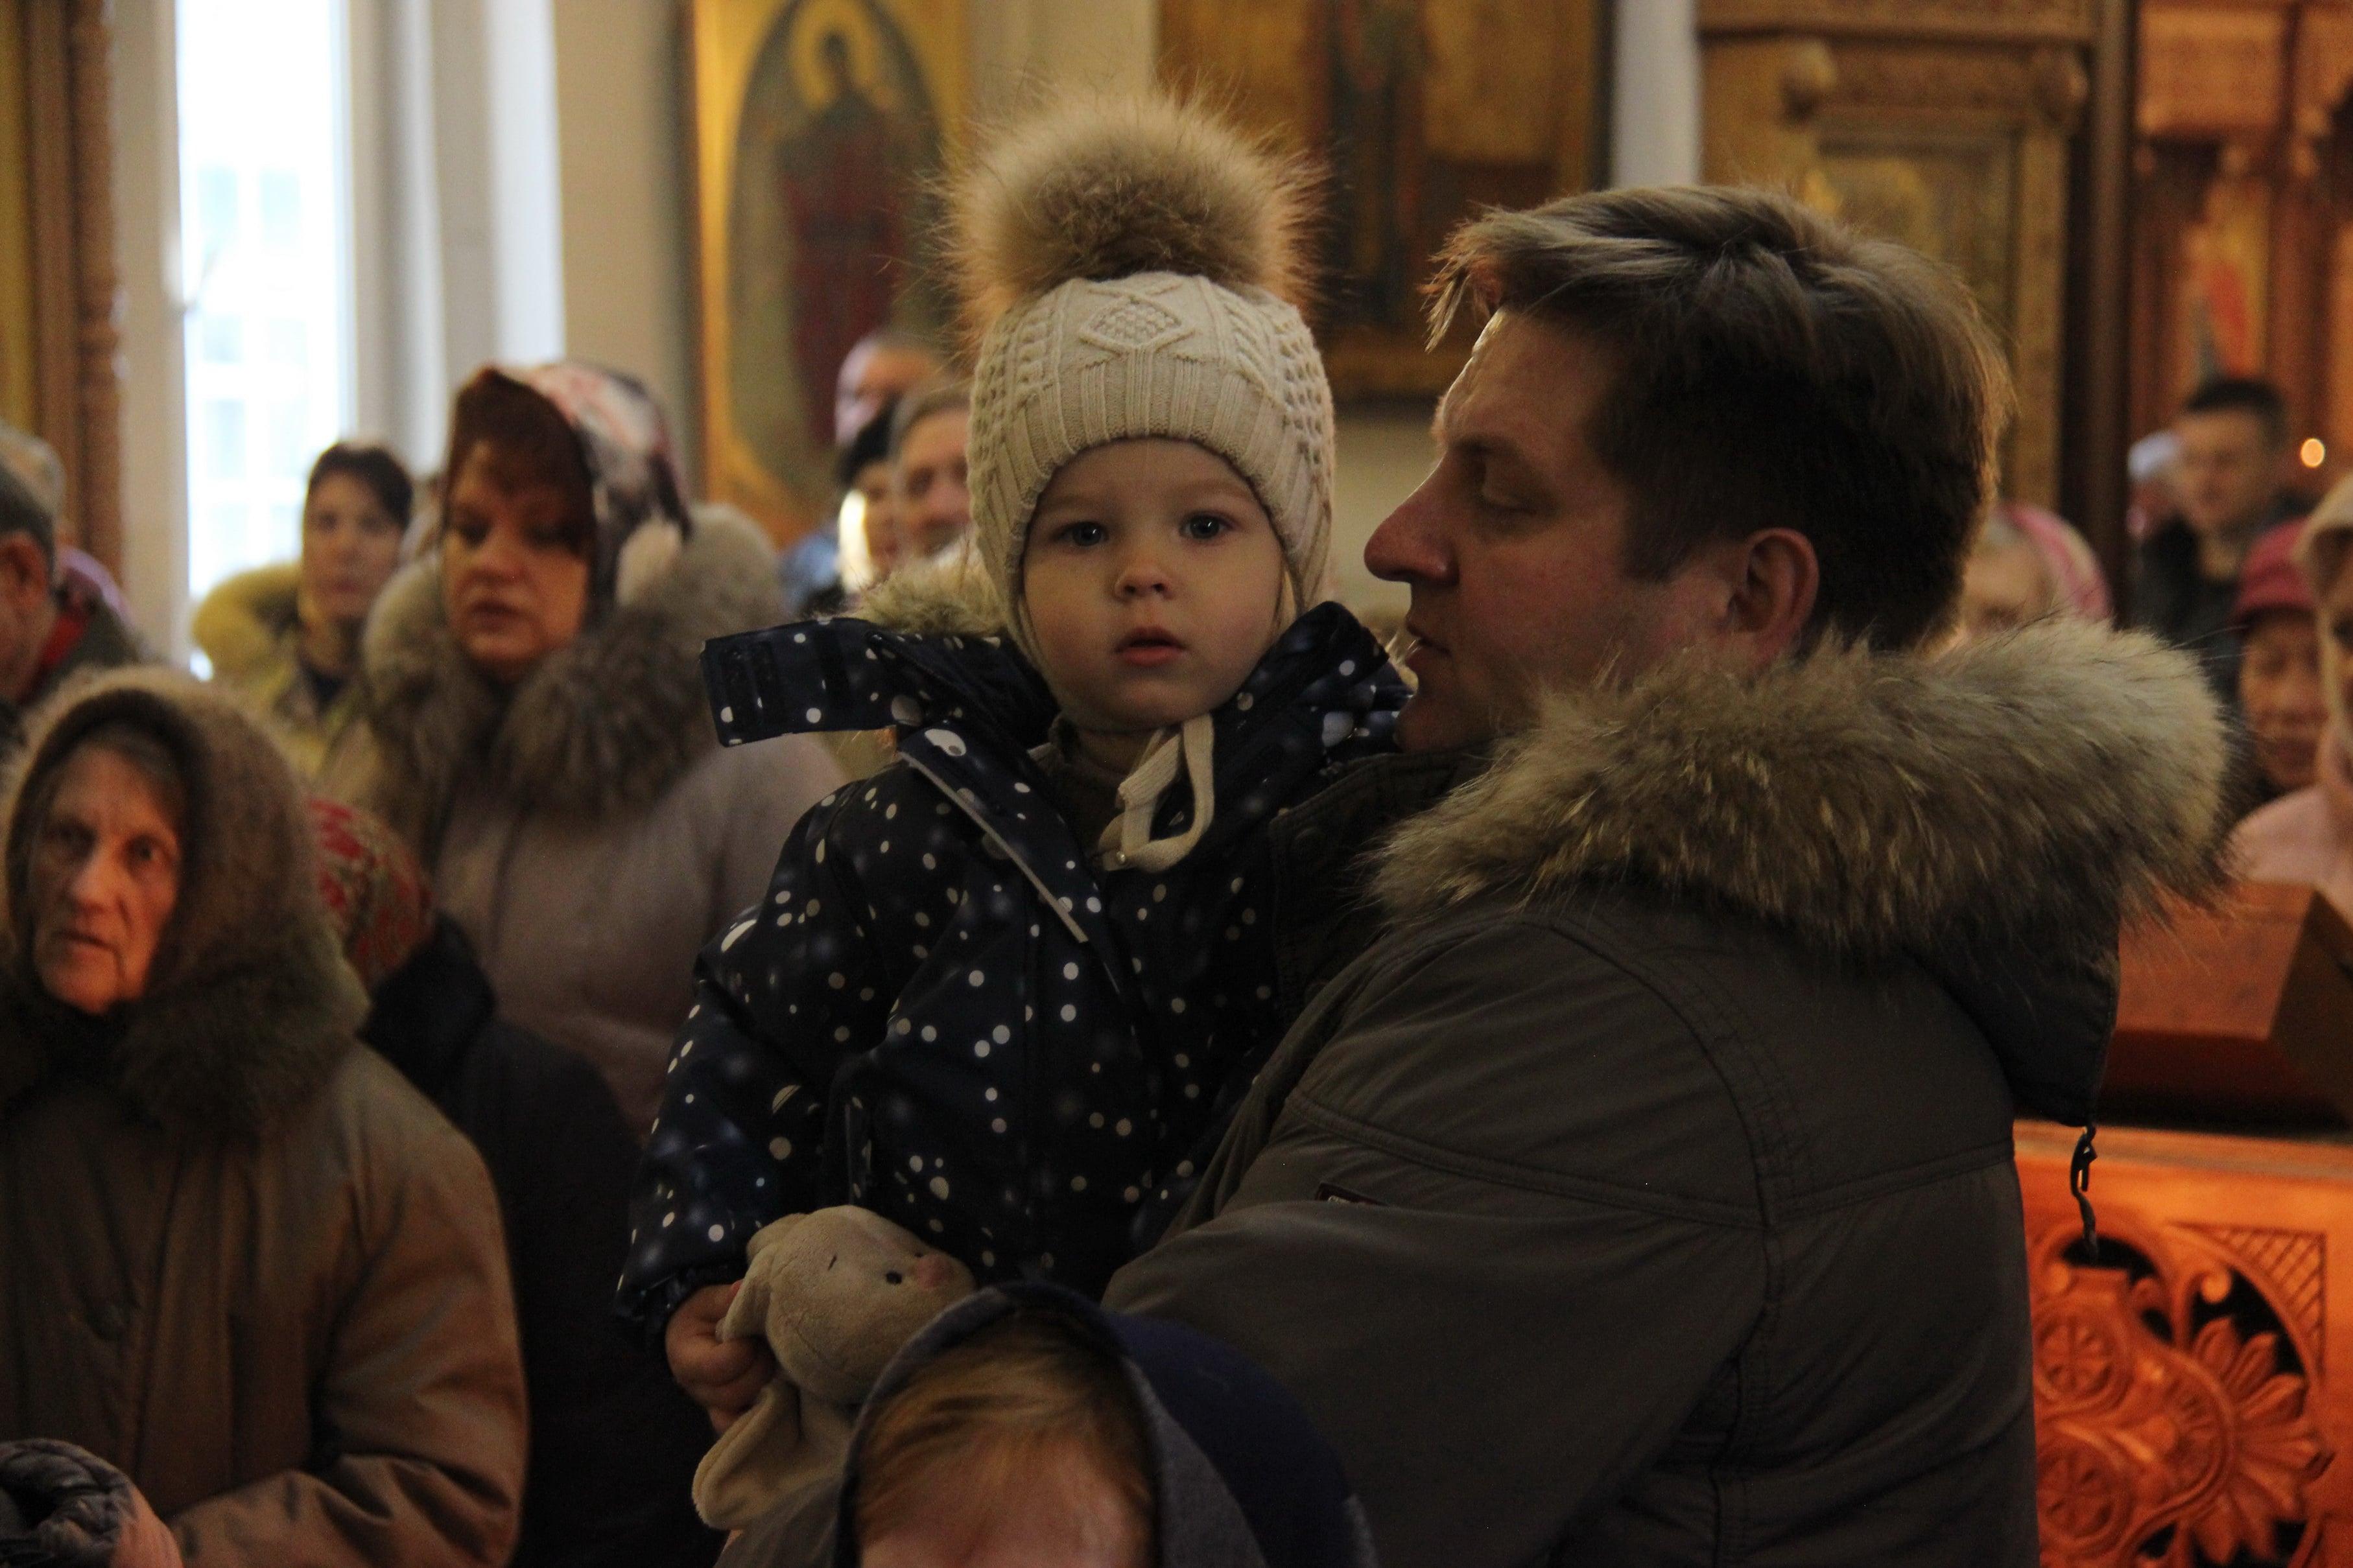 http://monuspen.ru/photoreports/ca3cfa76dabb081e45b240f799db68h0.JPG